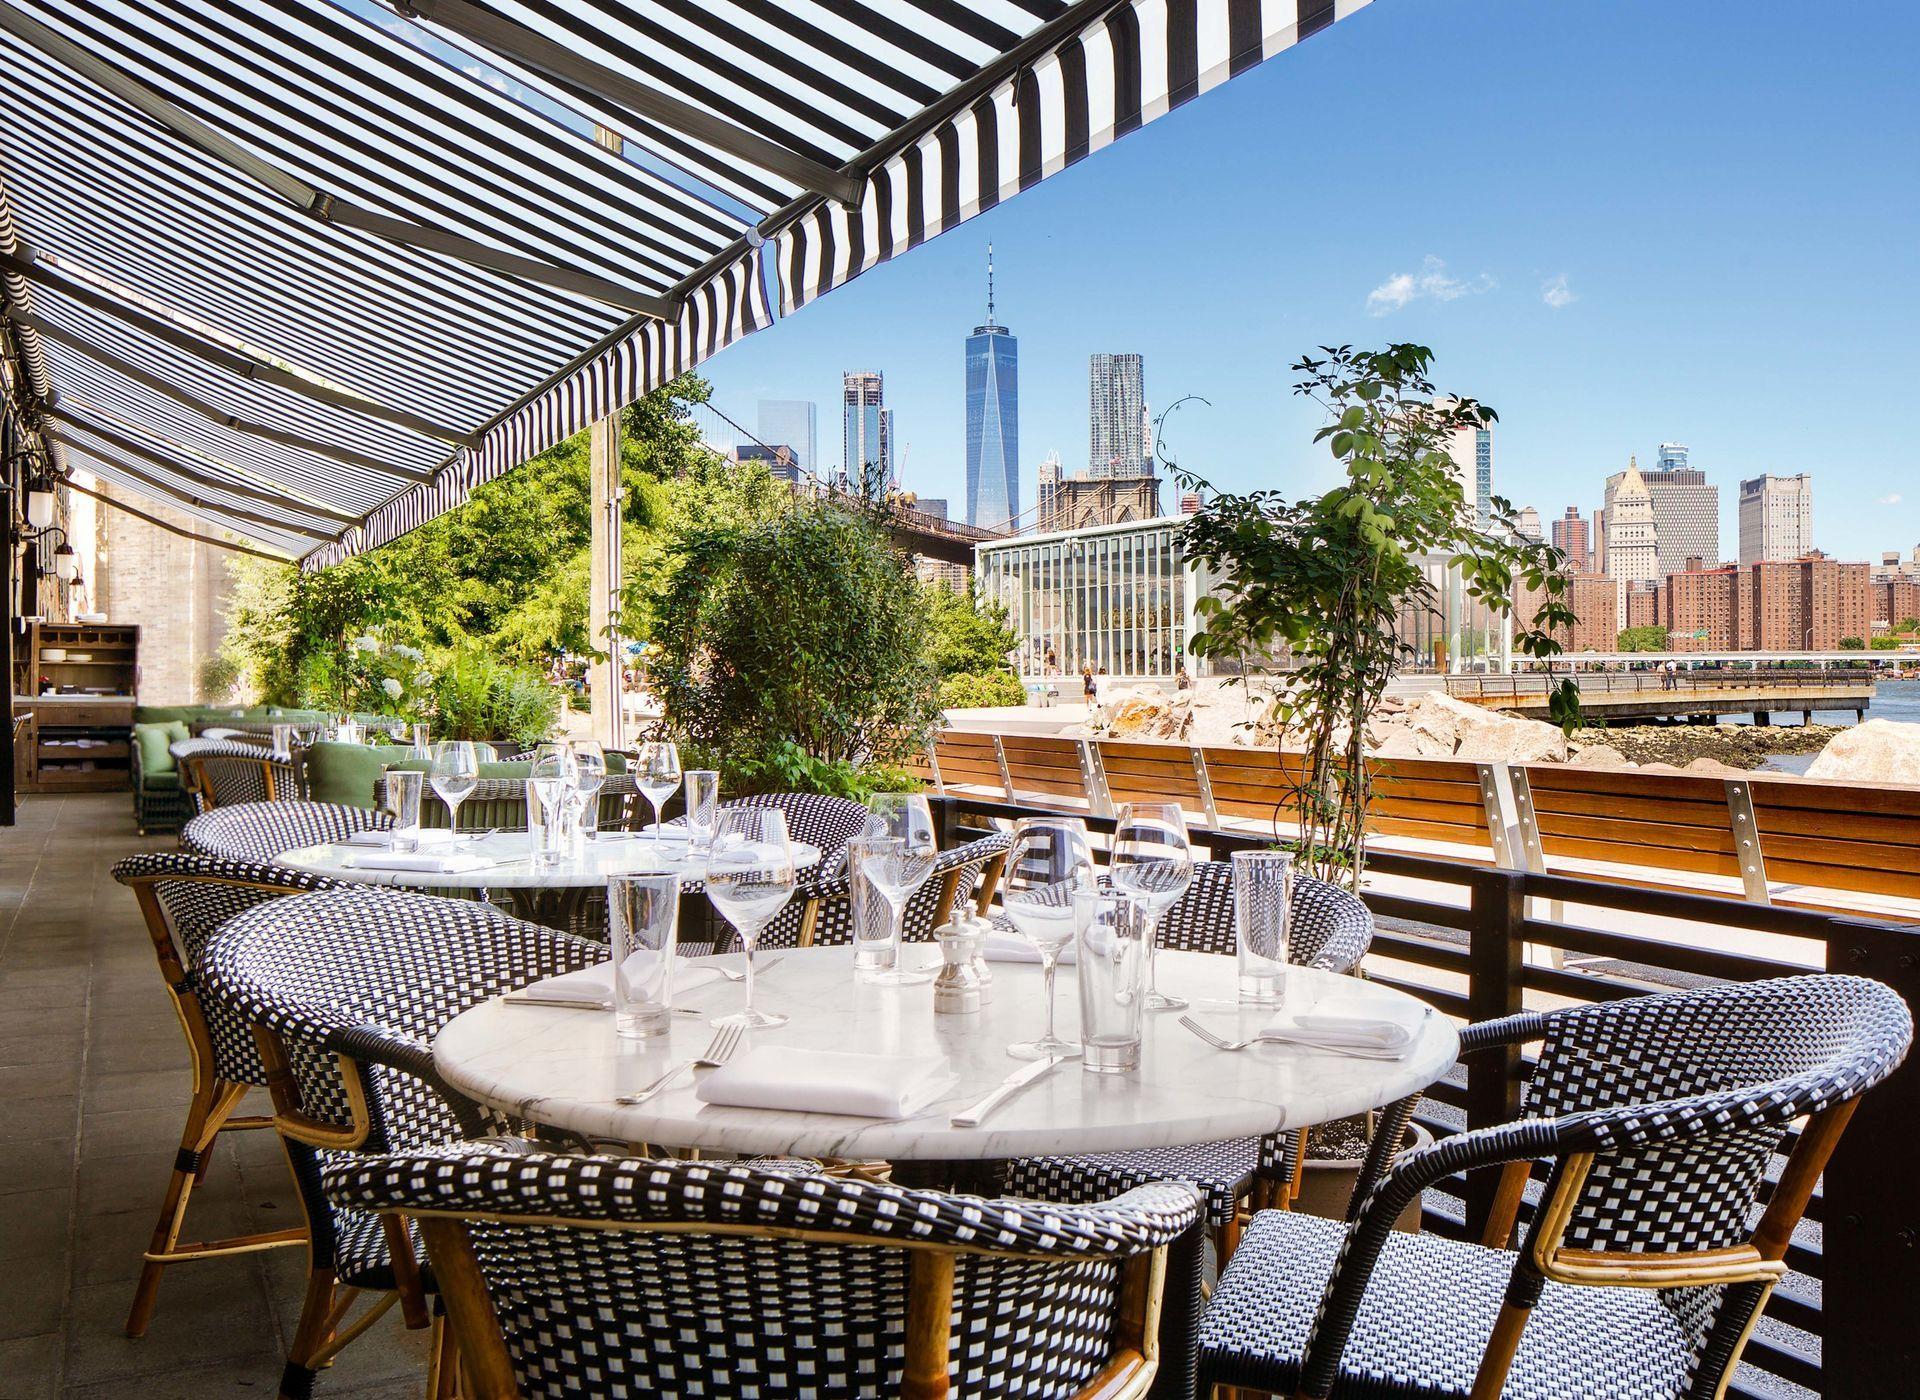 The Best Restaurants In New York 2017 With Images Restaurants